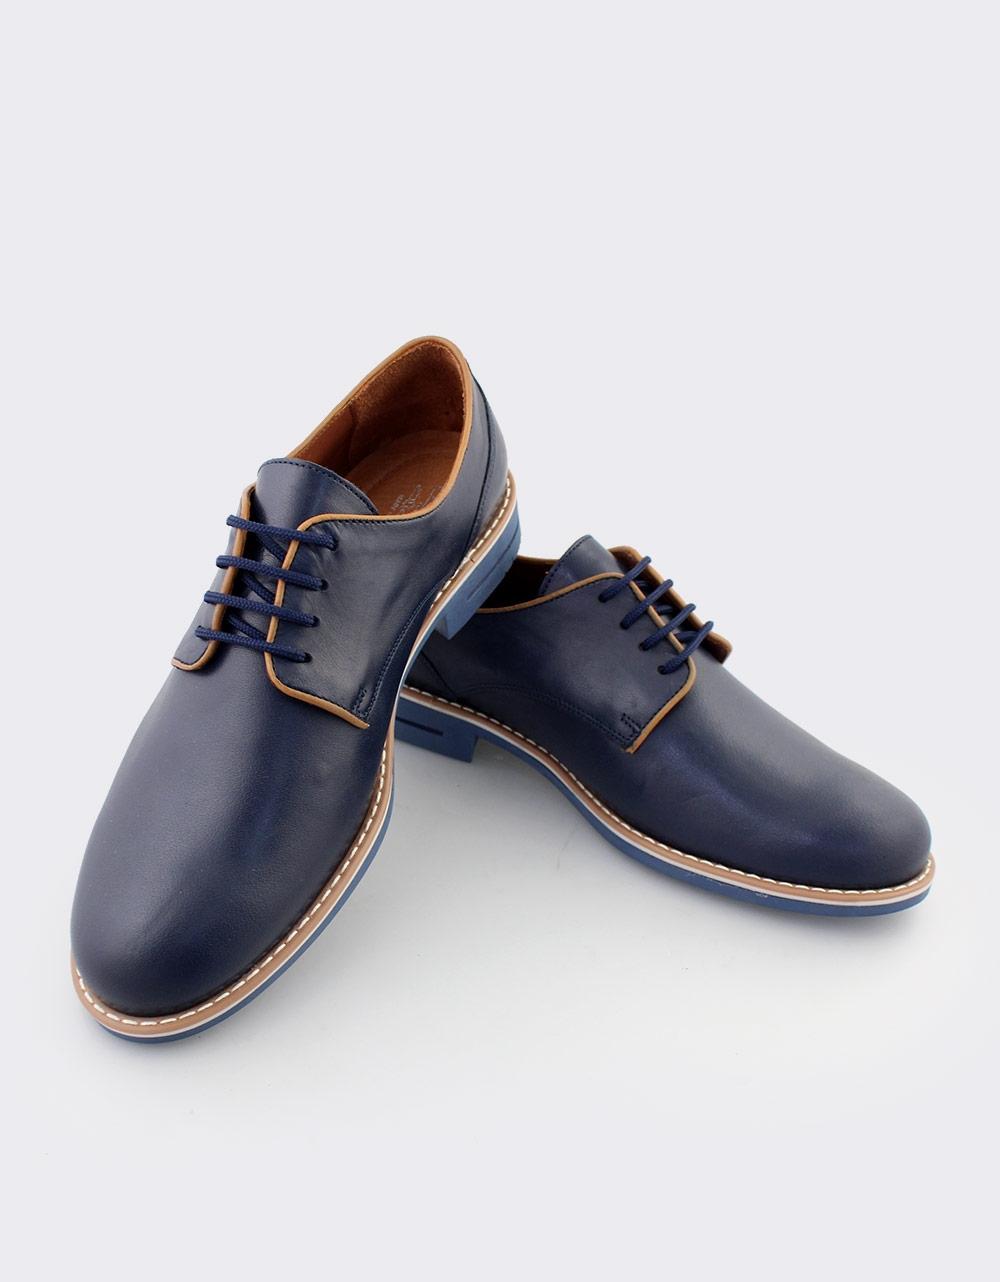 a28b4ca075 Inshoes.gr. Ανδρικά loafers δερμάτινα με δίχρωμη λεπτομέρεια ...